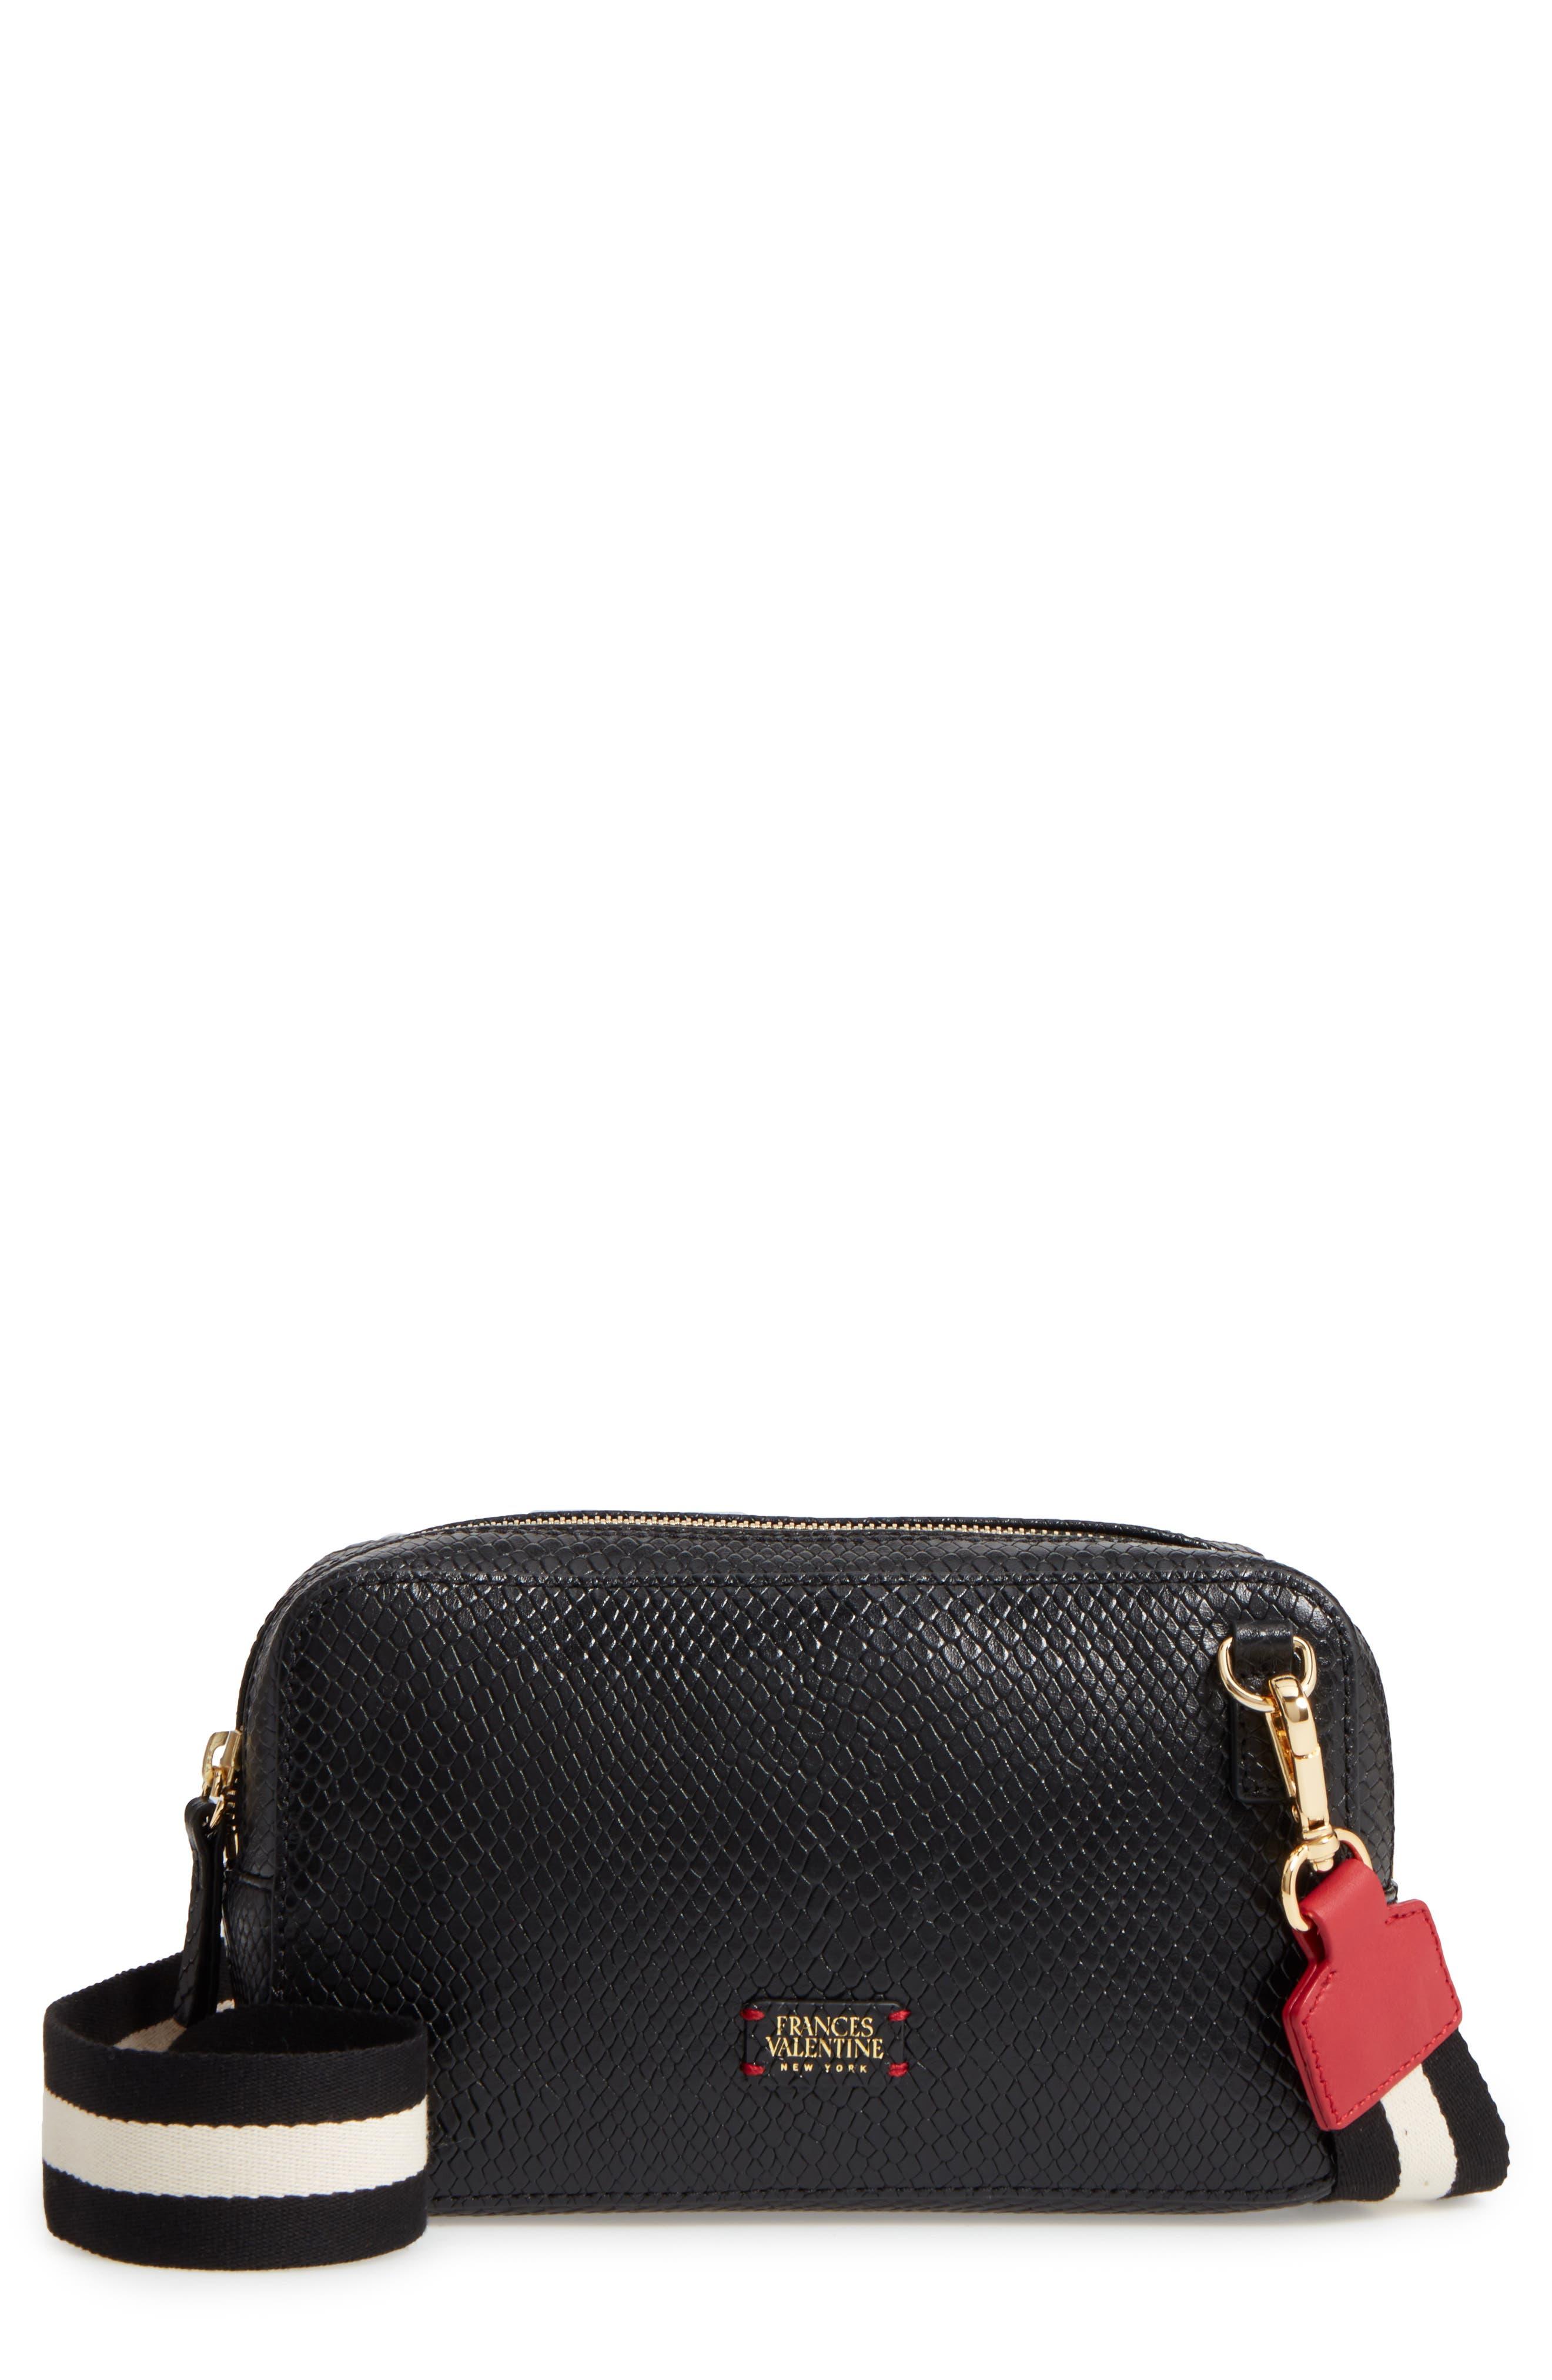 Snakeskin Embossed Leather Crossbody Bag,                             Main thumbnail 1, color,                             Black